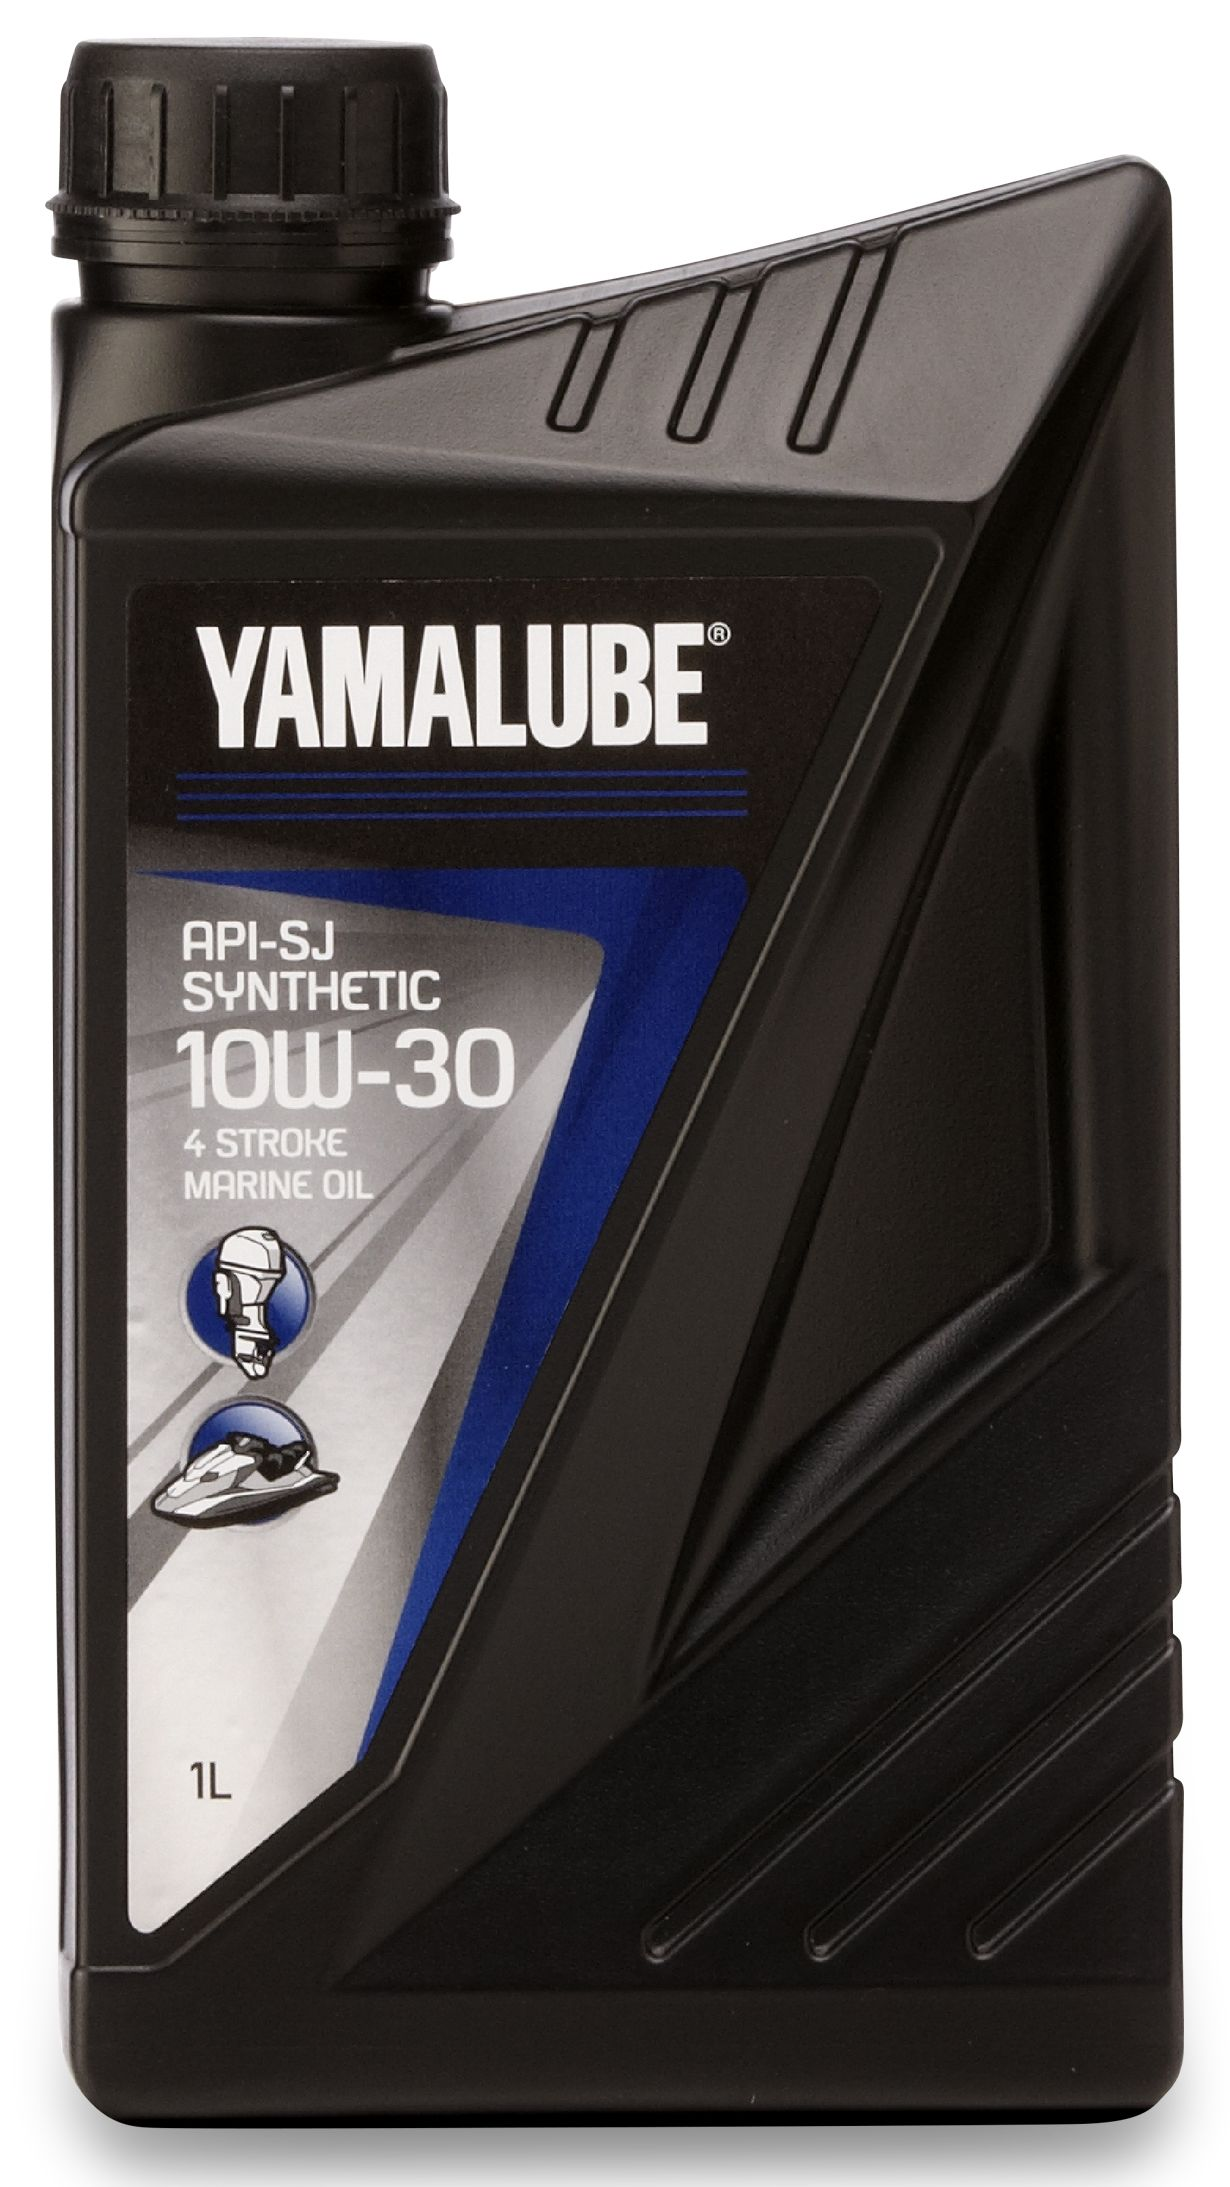 Масло моторное Yamalube 4-S API-SJ 10W-30 1 литр - фото 1